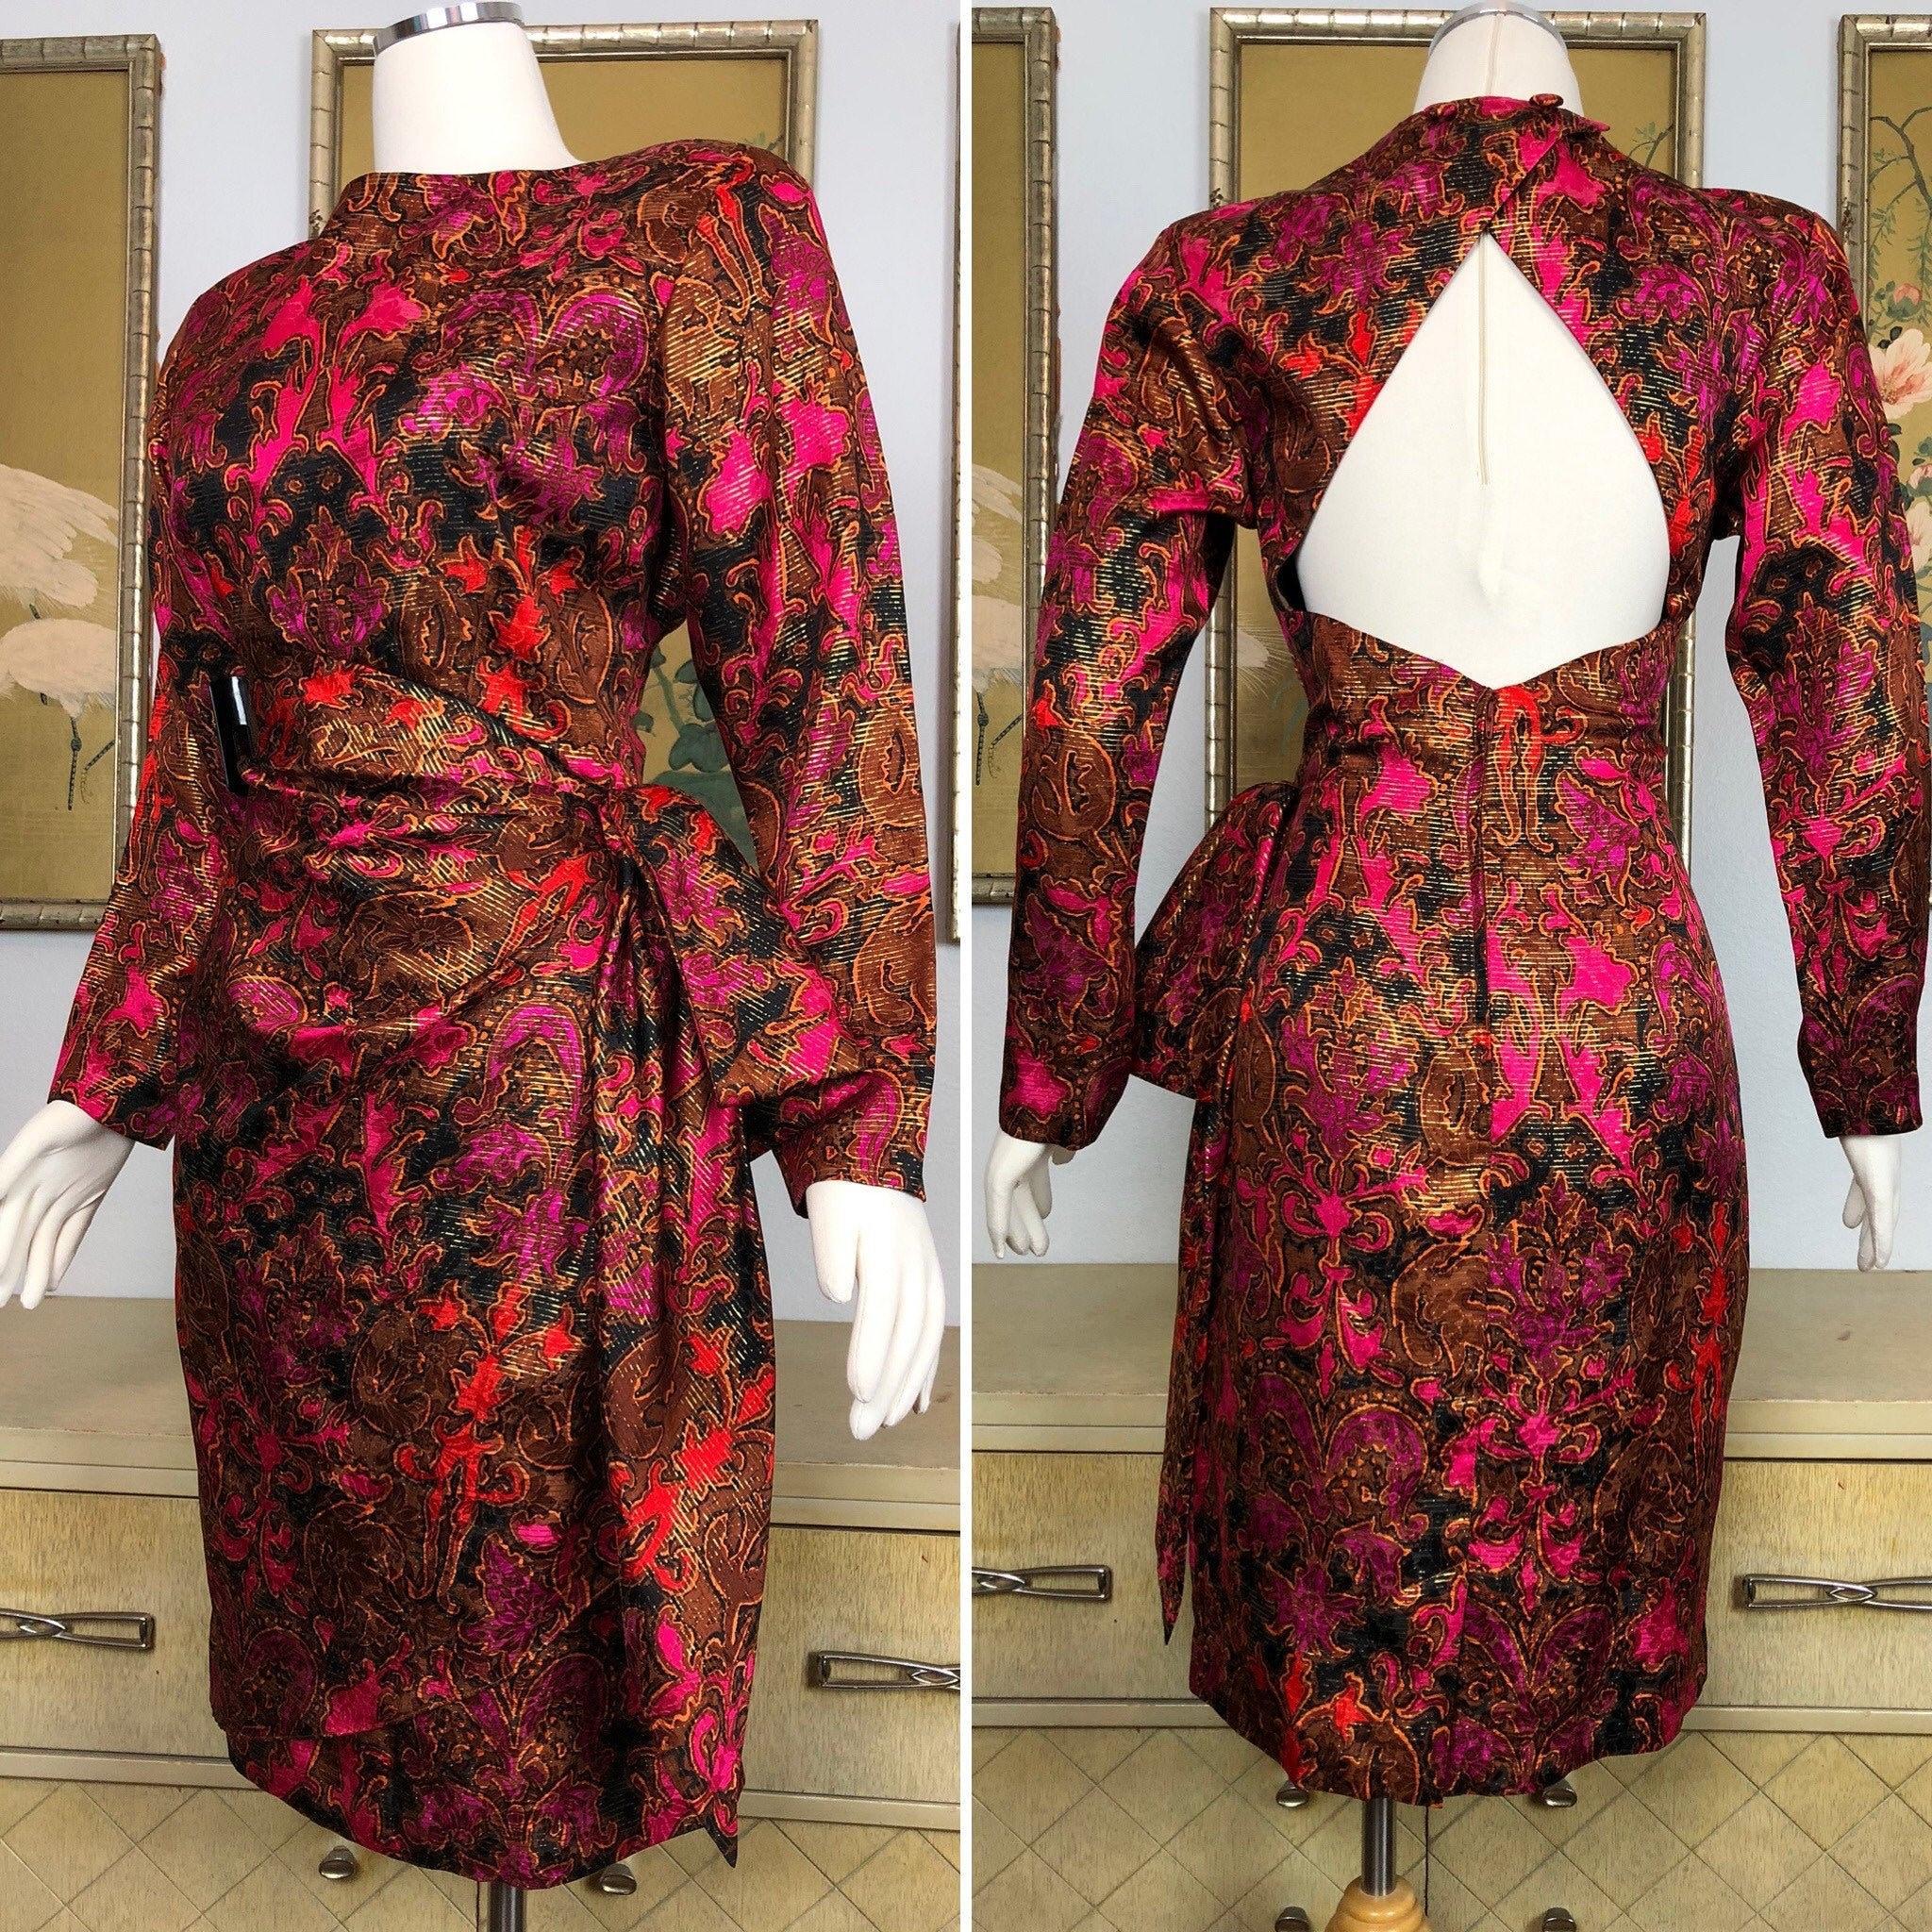 80s Dresses   Casual to Party Dresses 1980S Vintage Silk Faux Sarong Dress Vibrant Print Tropical Print $27.50 AT vintagedancer.com